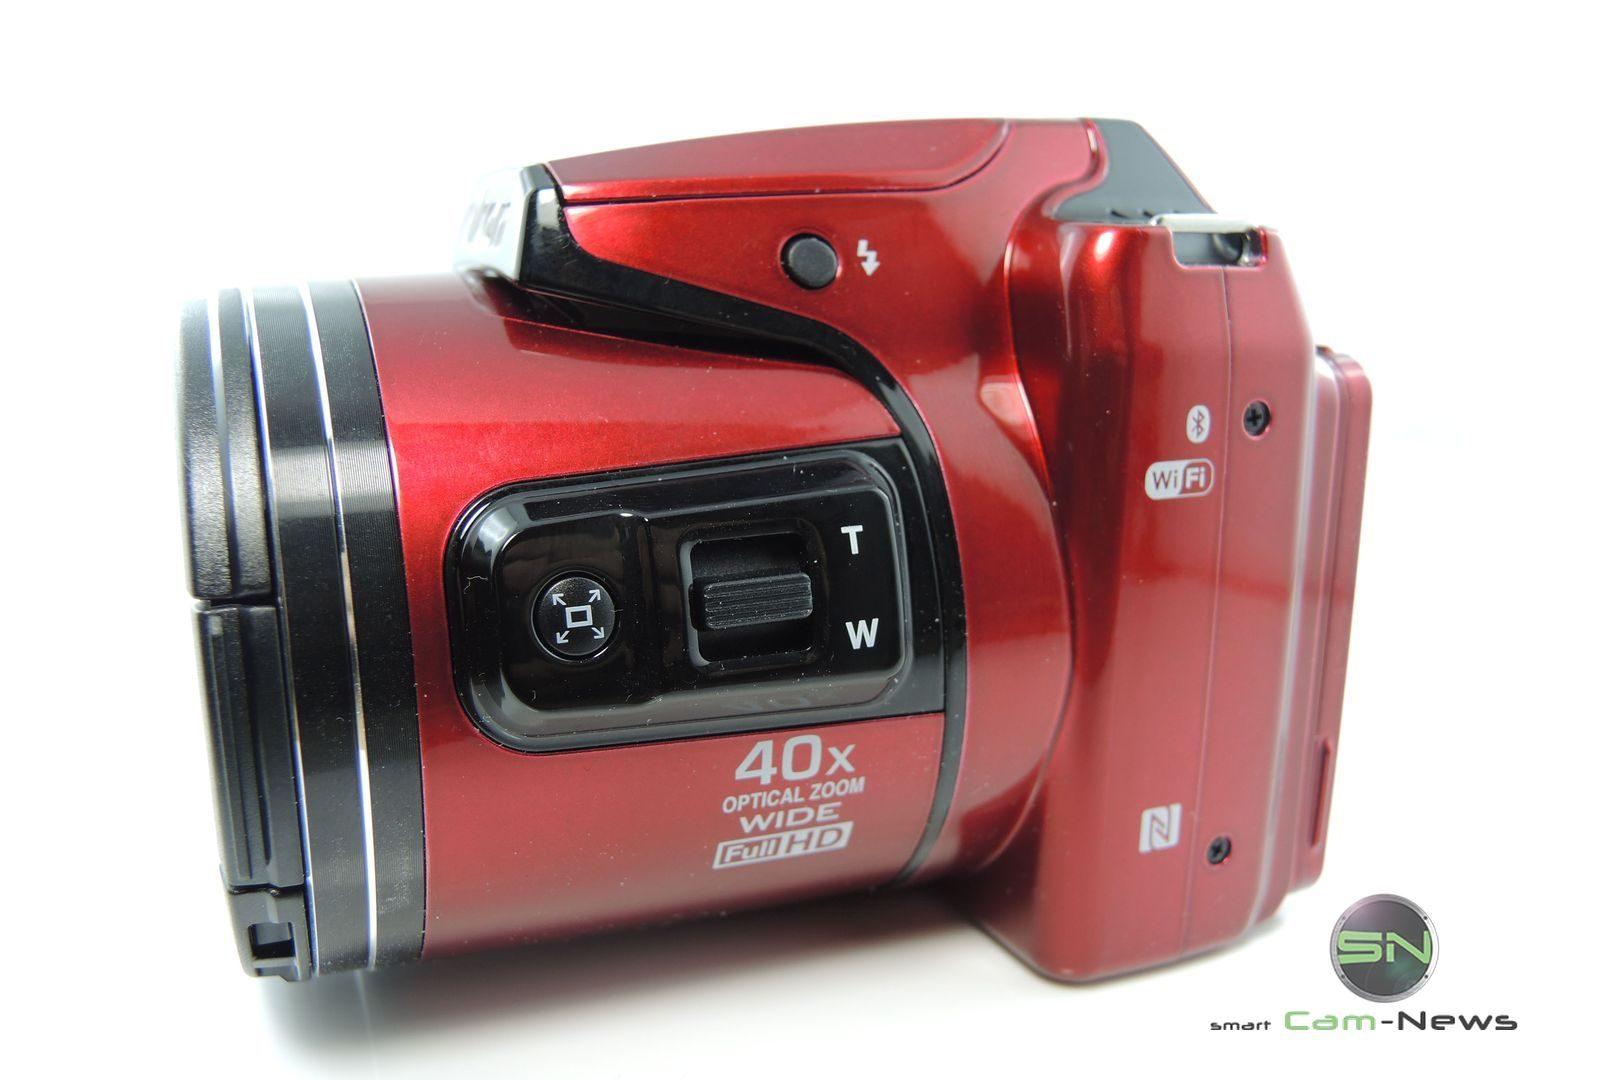 manueller-zoom-nikon-b500-smartcamnews